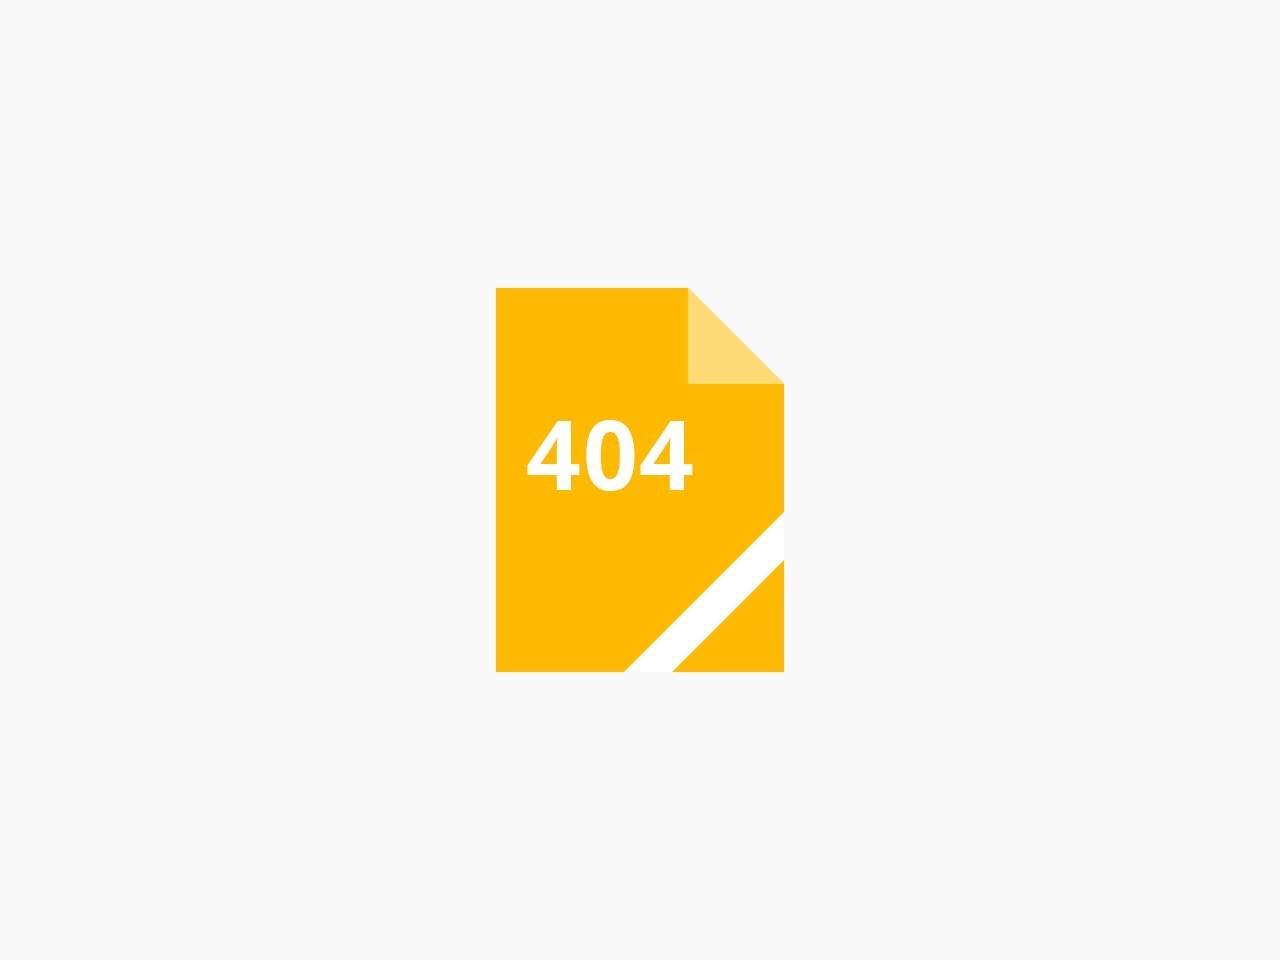 Bitcoin [BTC/USD] Technical Analysis: Bull to succeed over bear's occasional threats